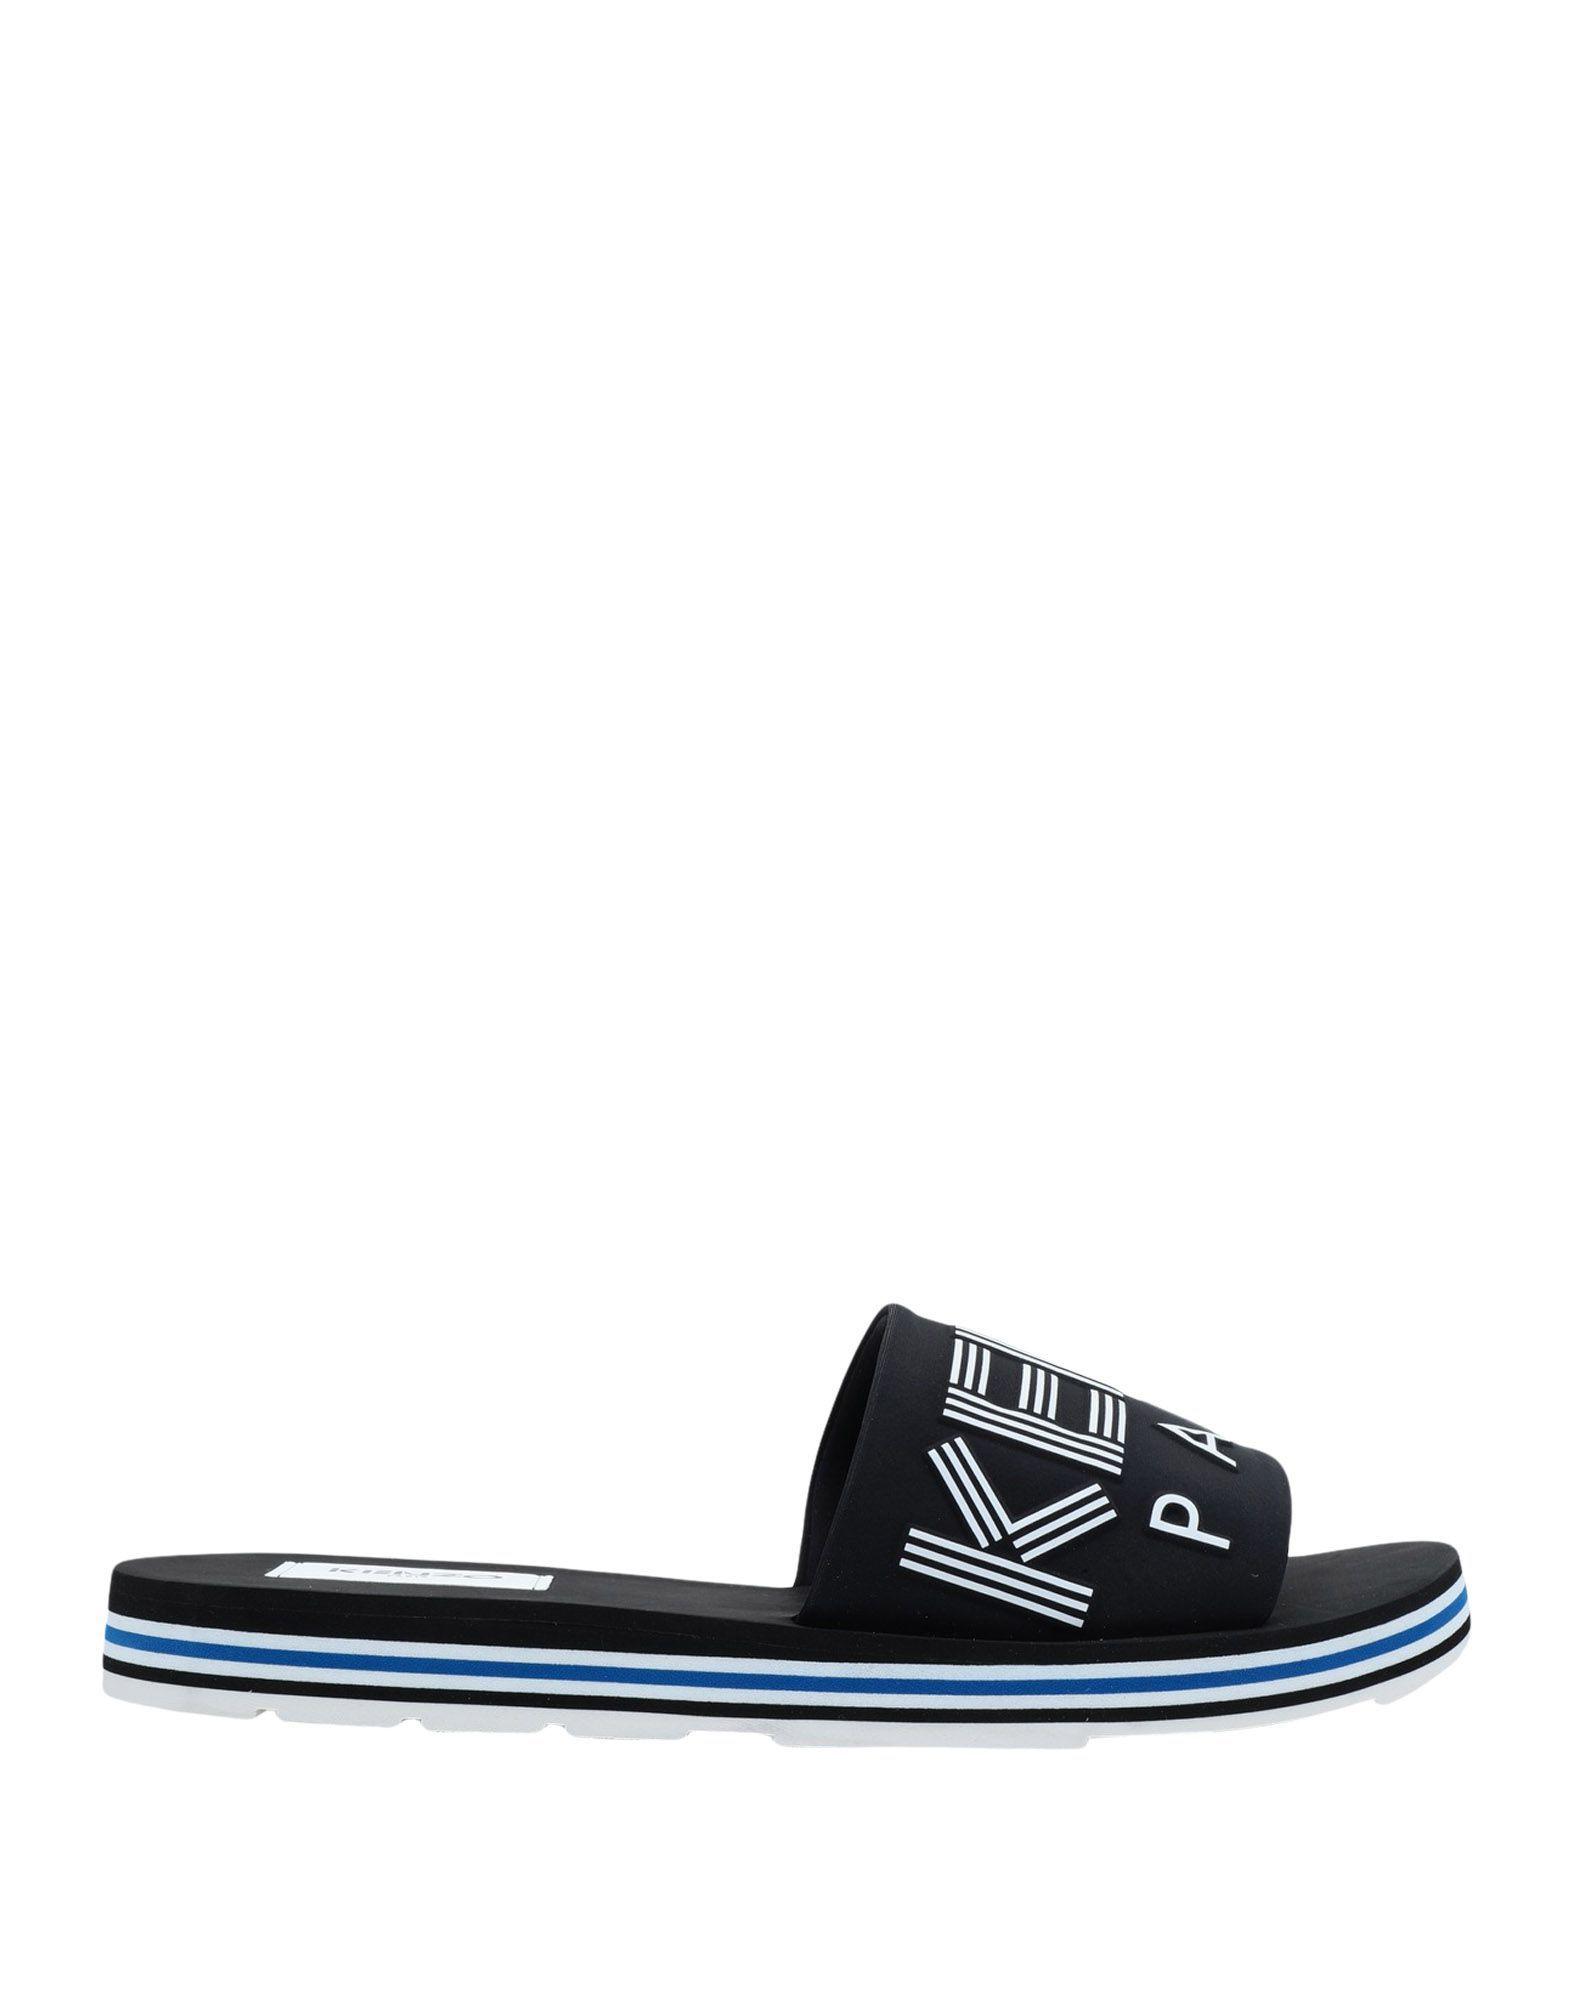 Kenzo Black Synthetic Fibers Sandals